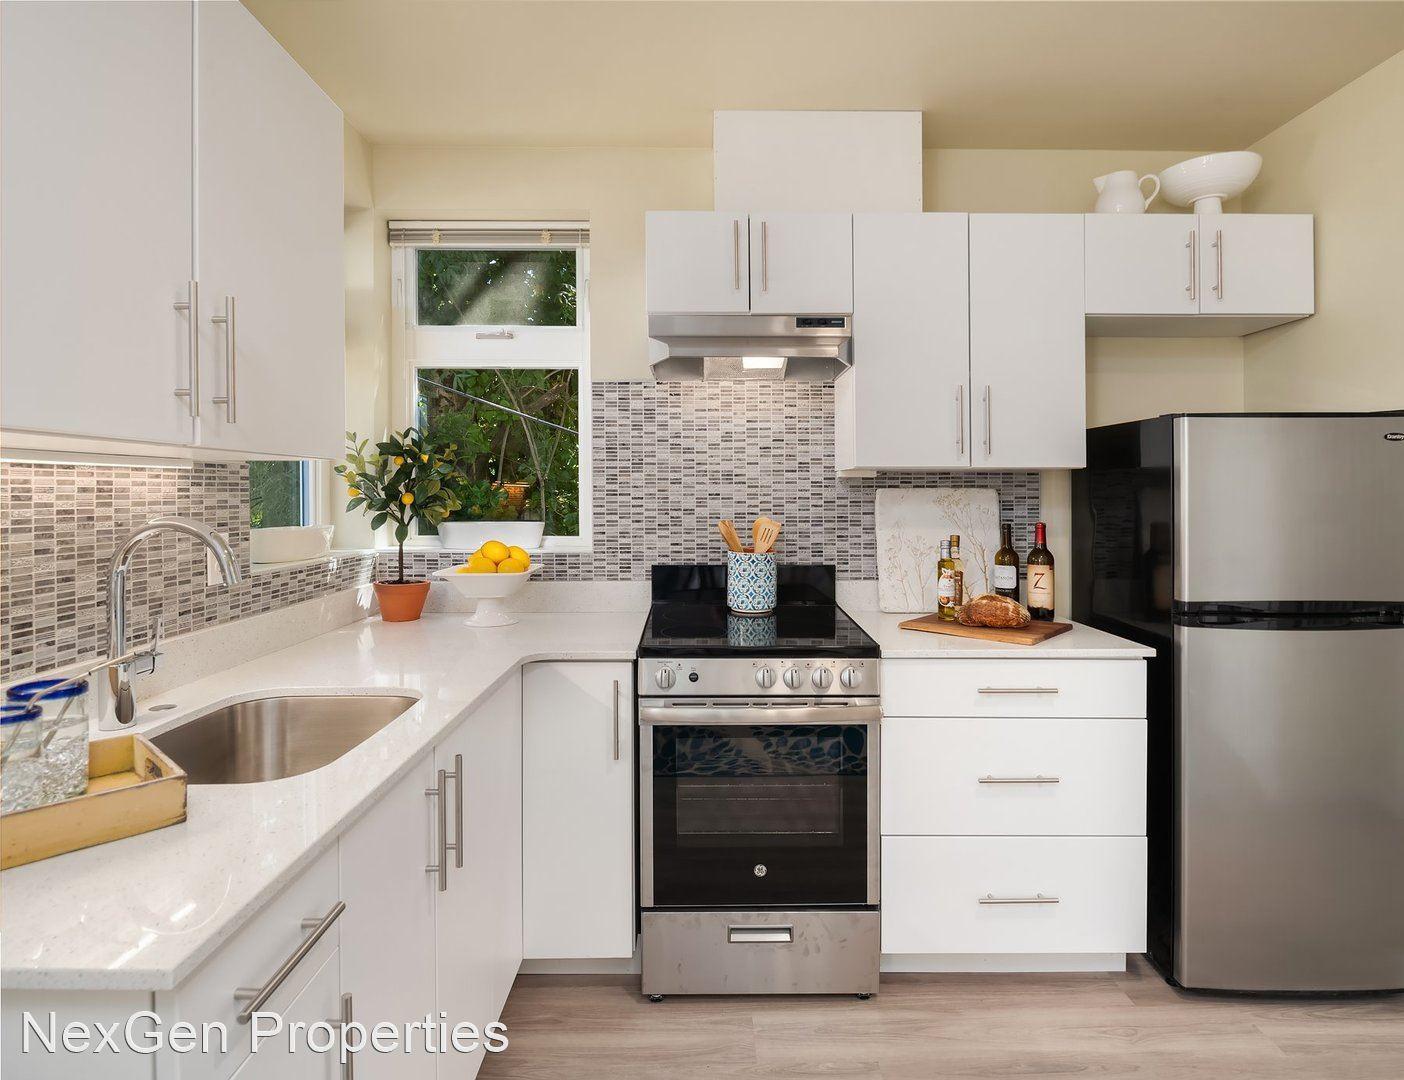 Apartments Near SCC Cubix Northgate for Shoreline Community College Students in Shoreline, WA